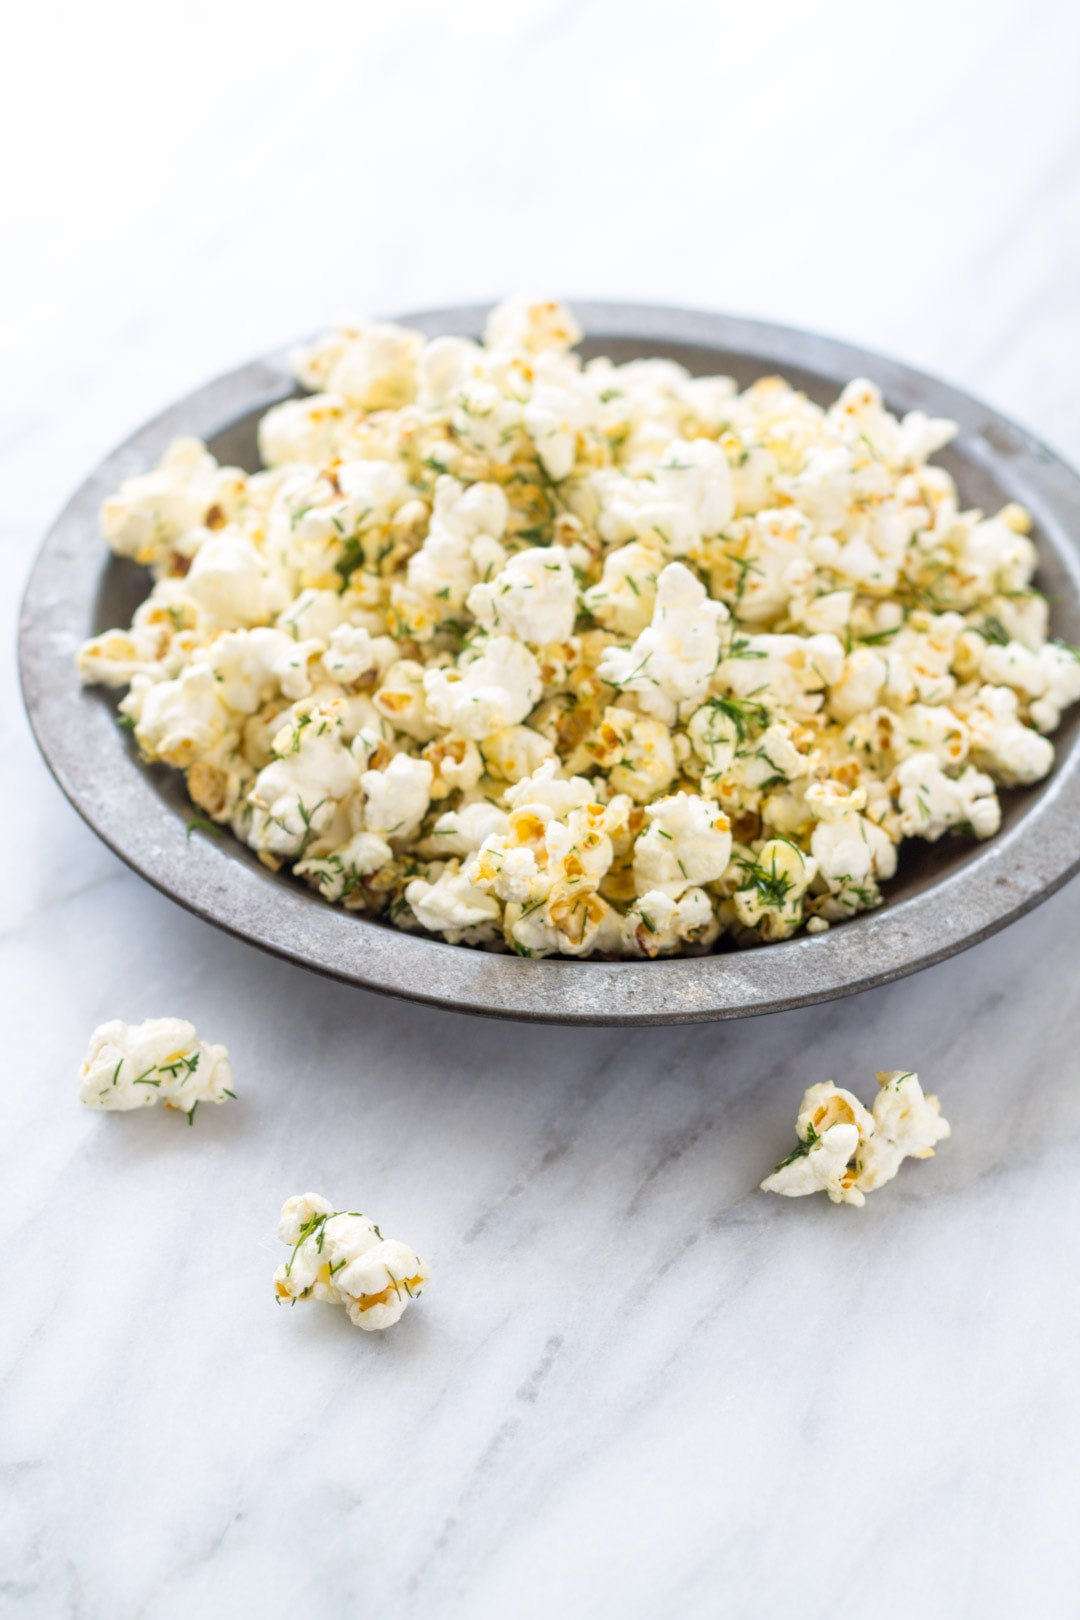 Low FODMAP Dill Pickle Popcorn